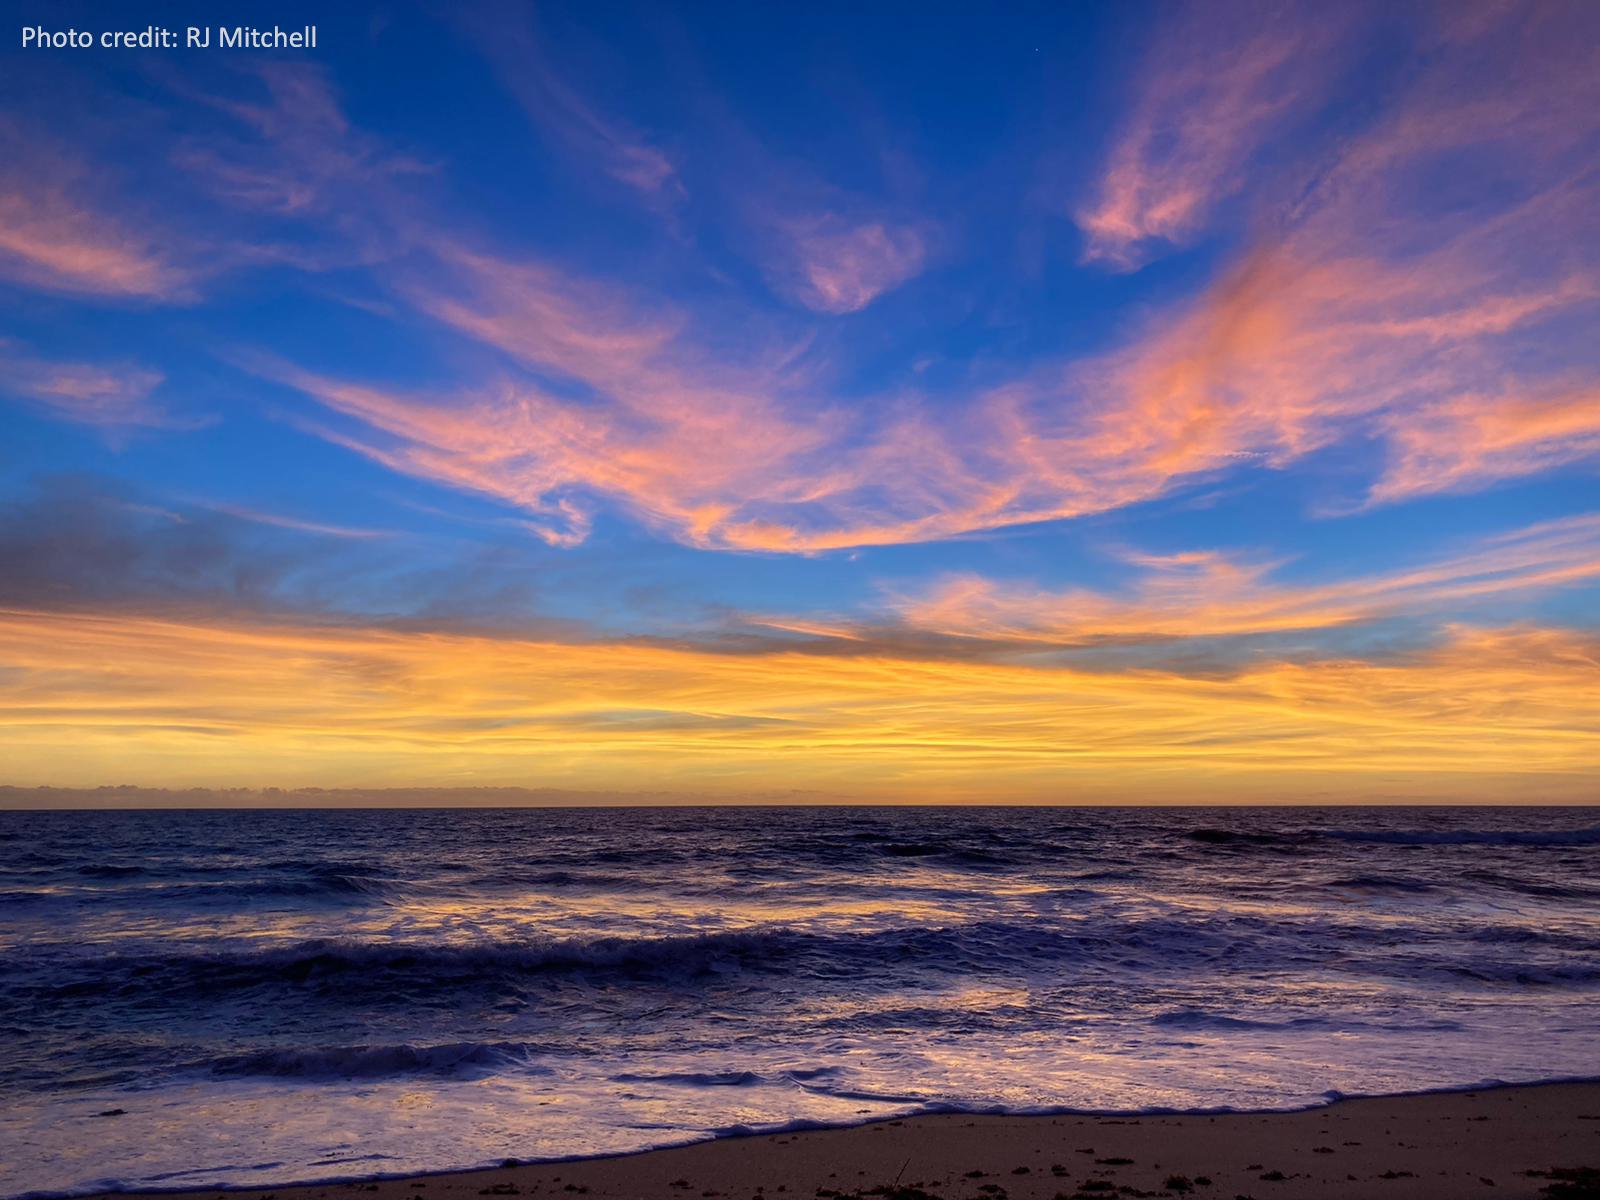 Sunrise at the Guana Tolomato Matanzas National Estuarine Research Reserve, Florida